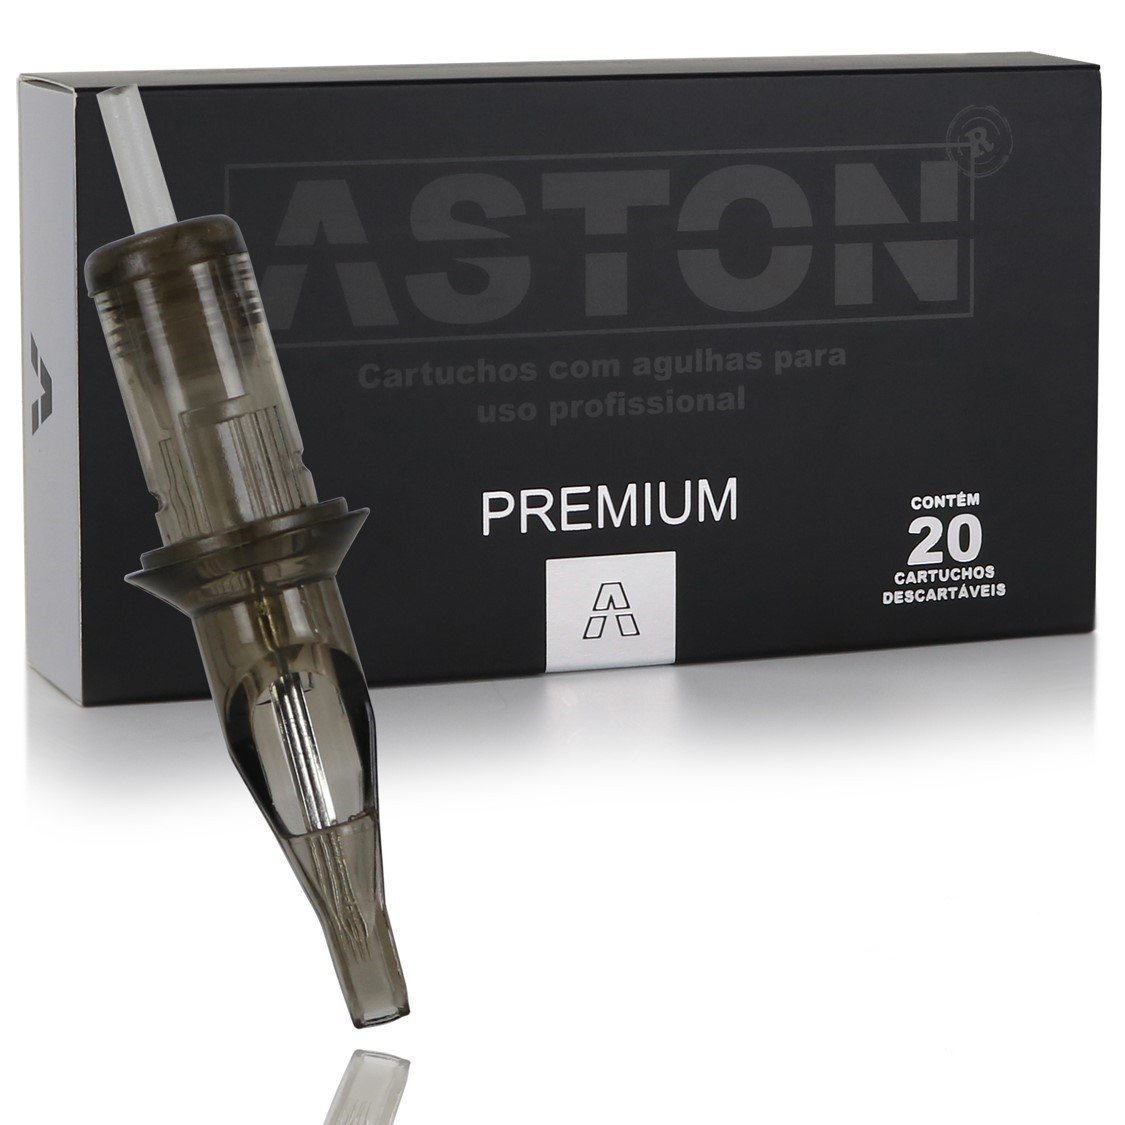 CAIXA CARTUCHO ASTON PREMIUM PINTURA MG (20 UN) - 1017MG